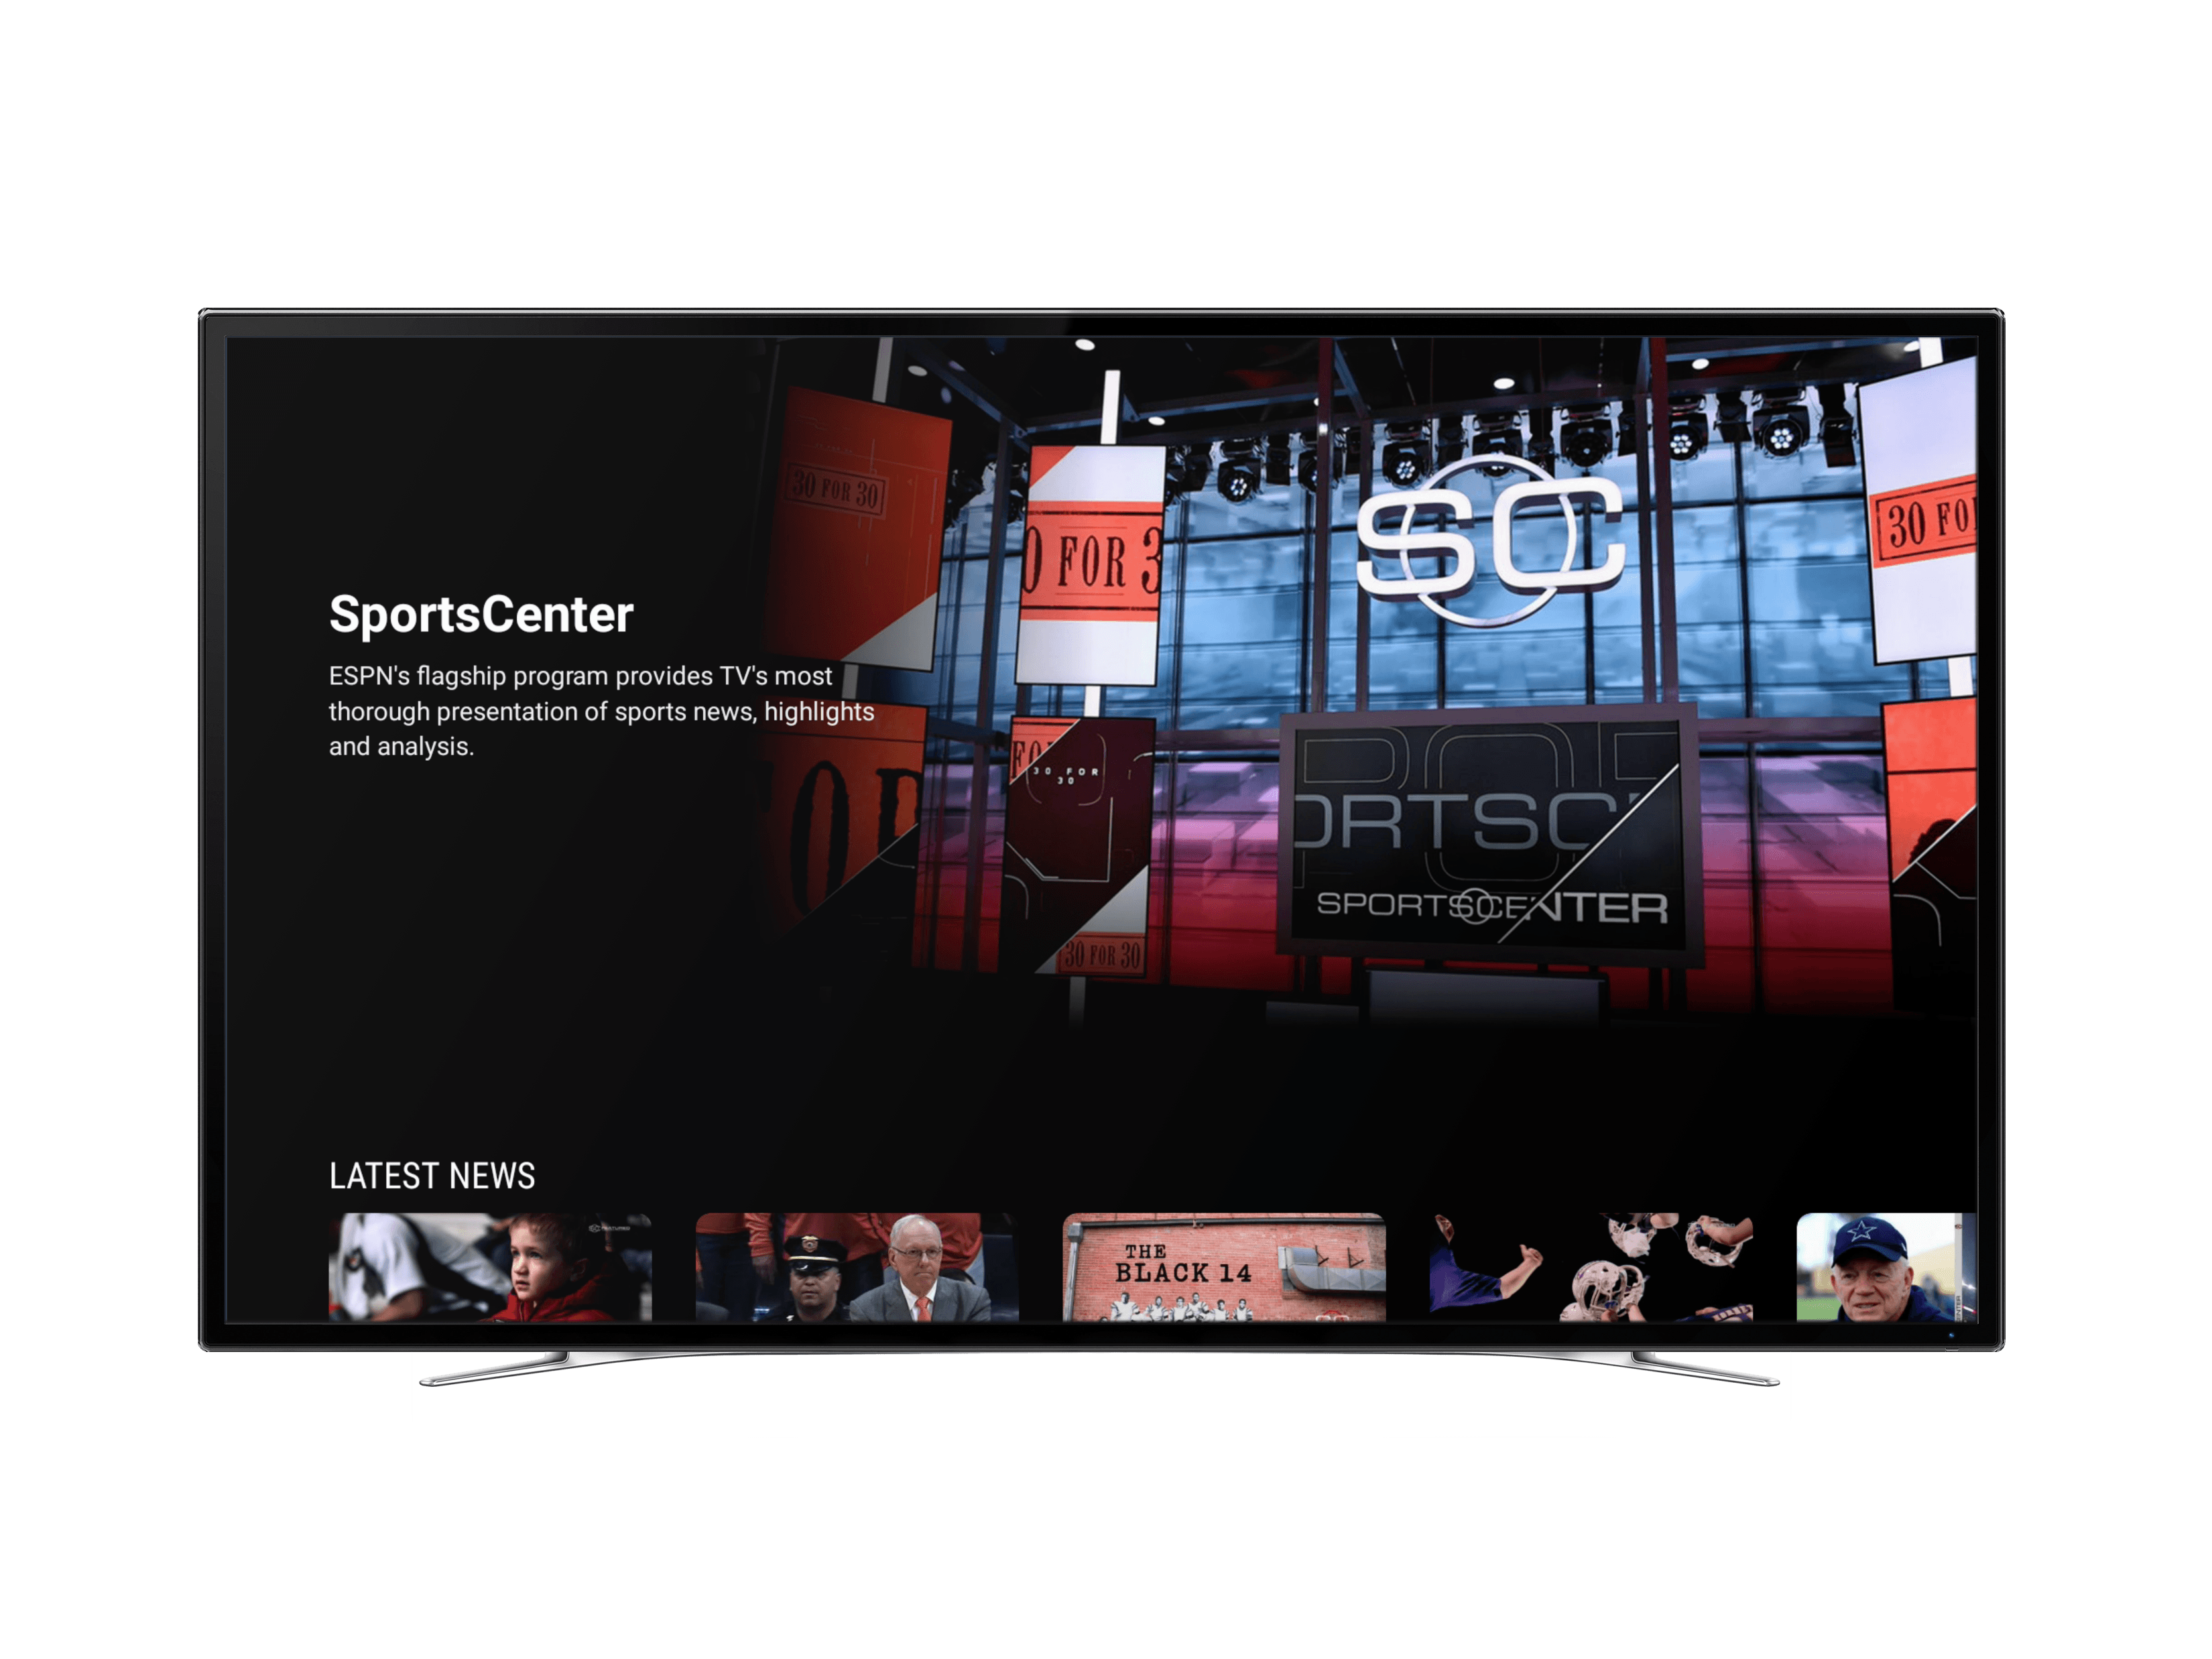 Espn Unveils New Digital Content In Digital Media Pitchfest Debut